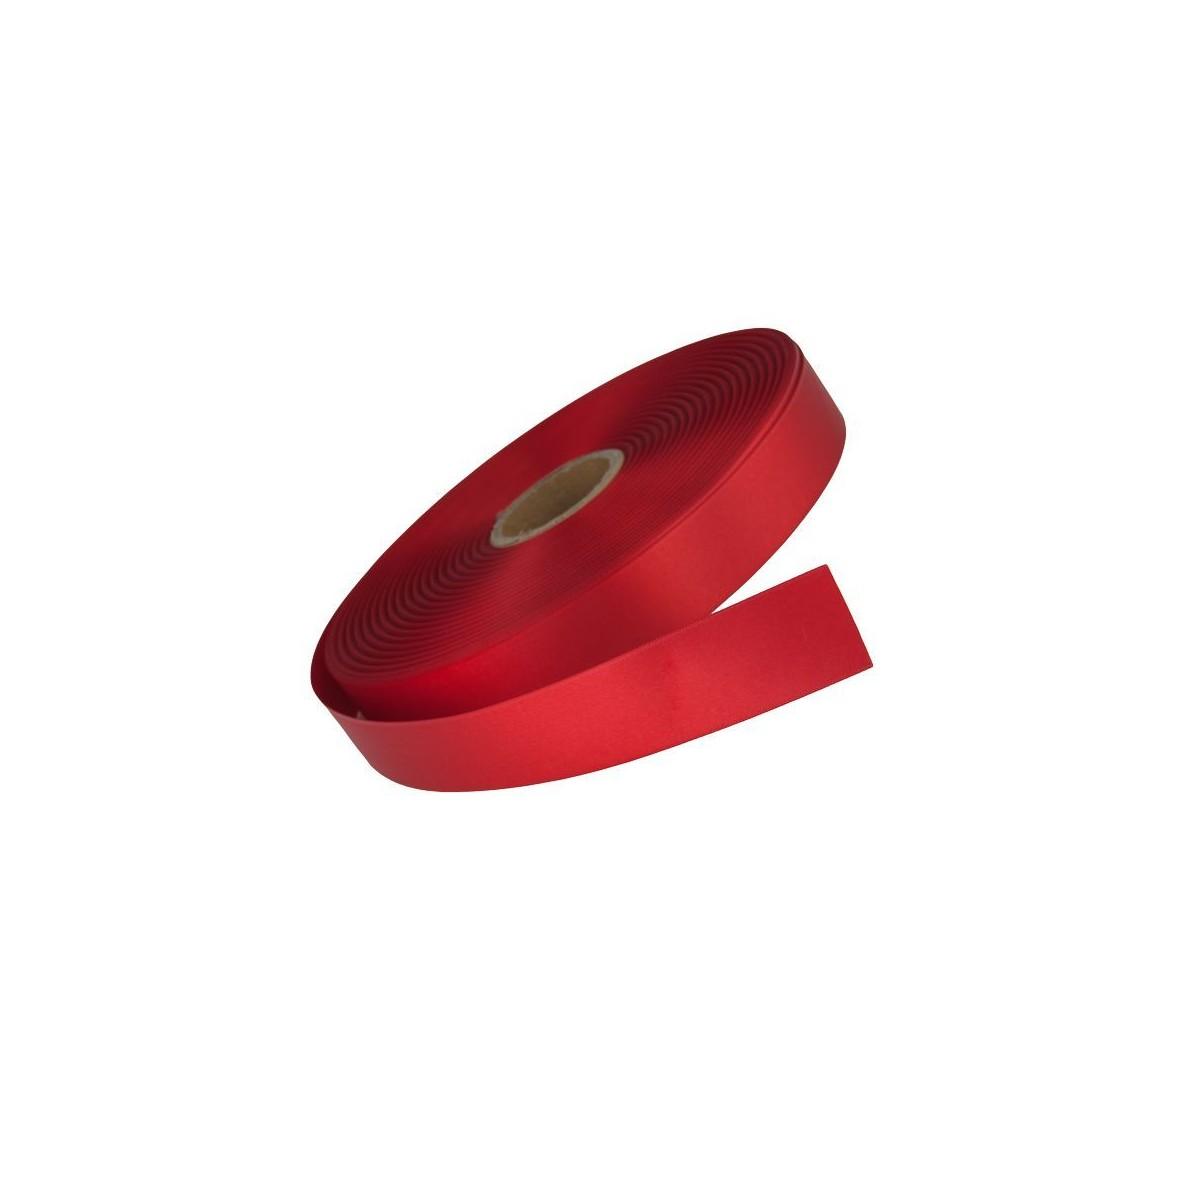 Ruban Satin Rouge 6mm - 25m